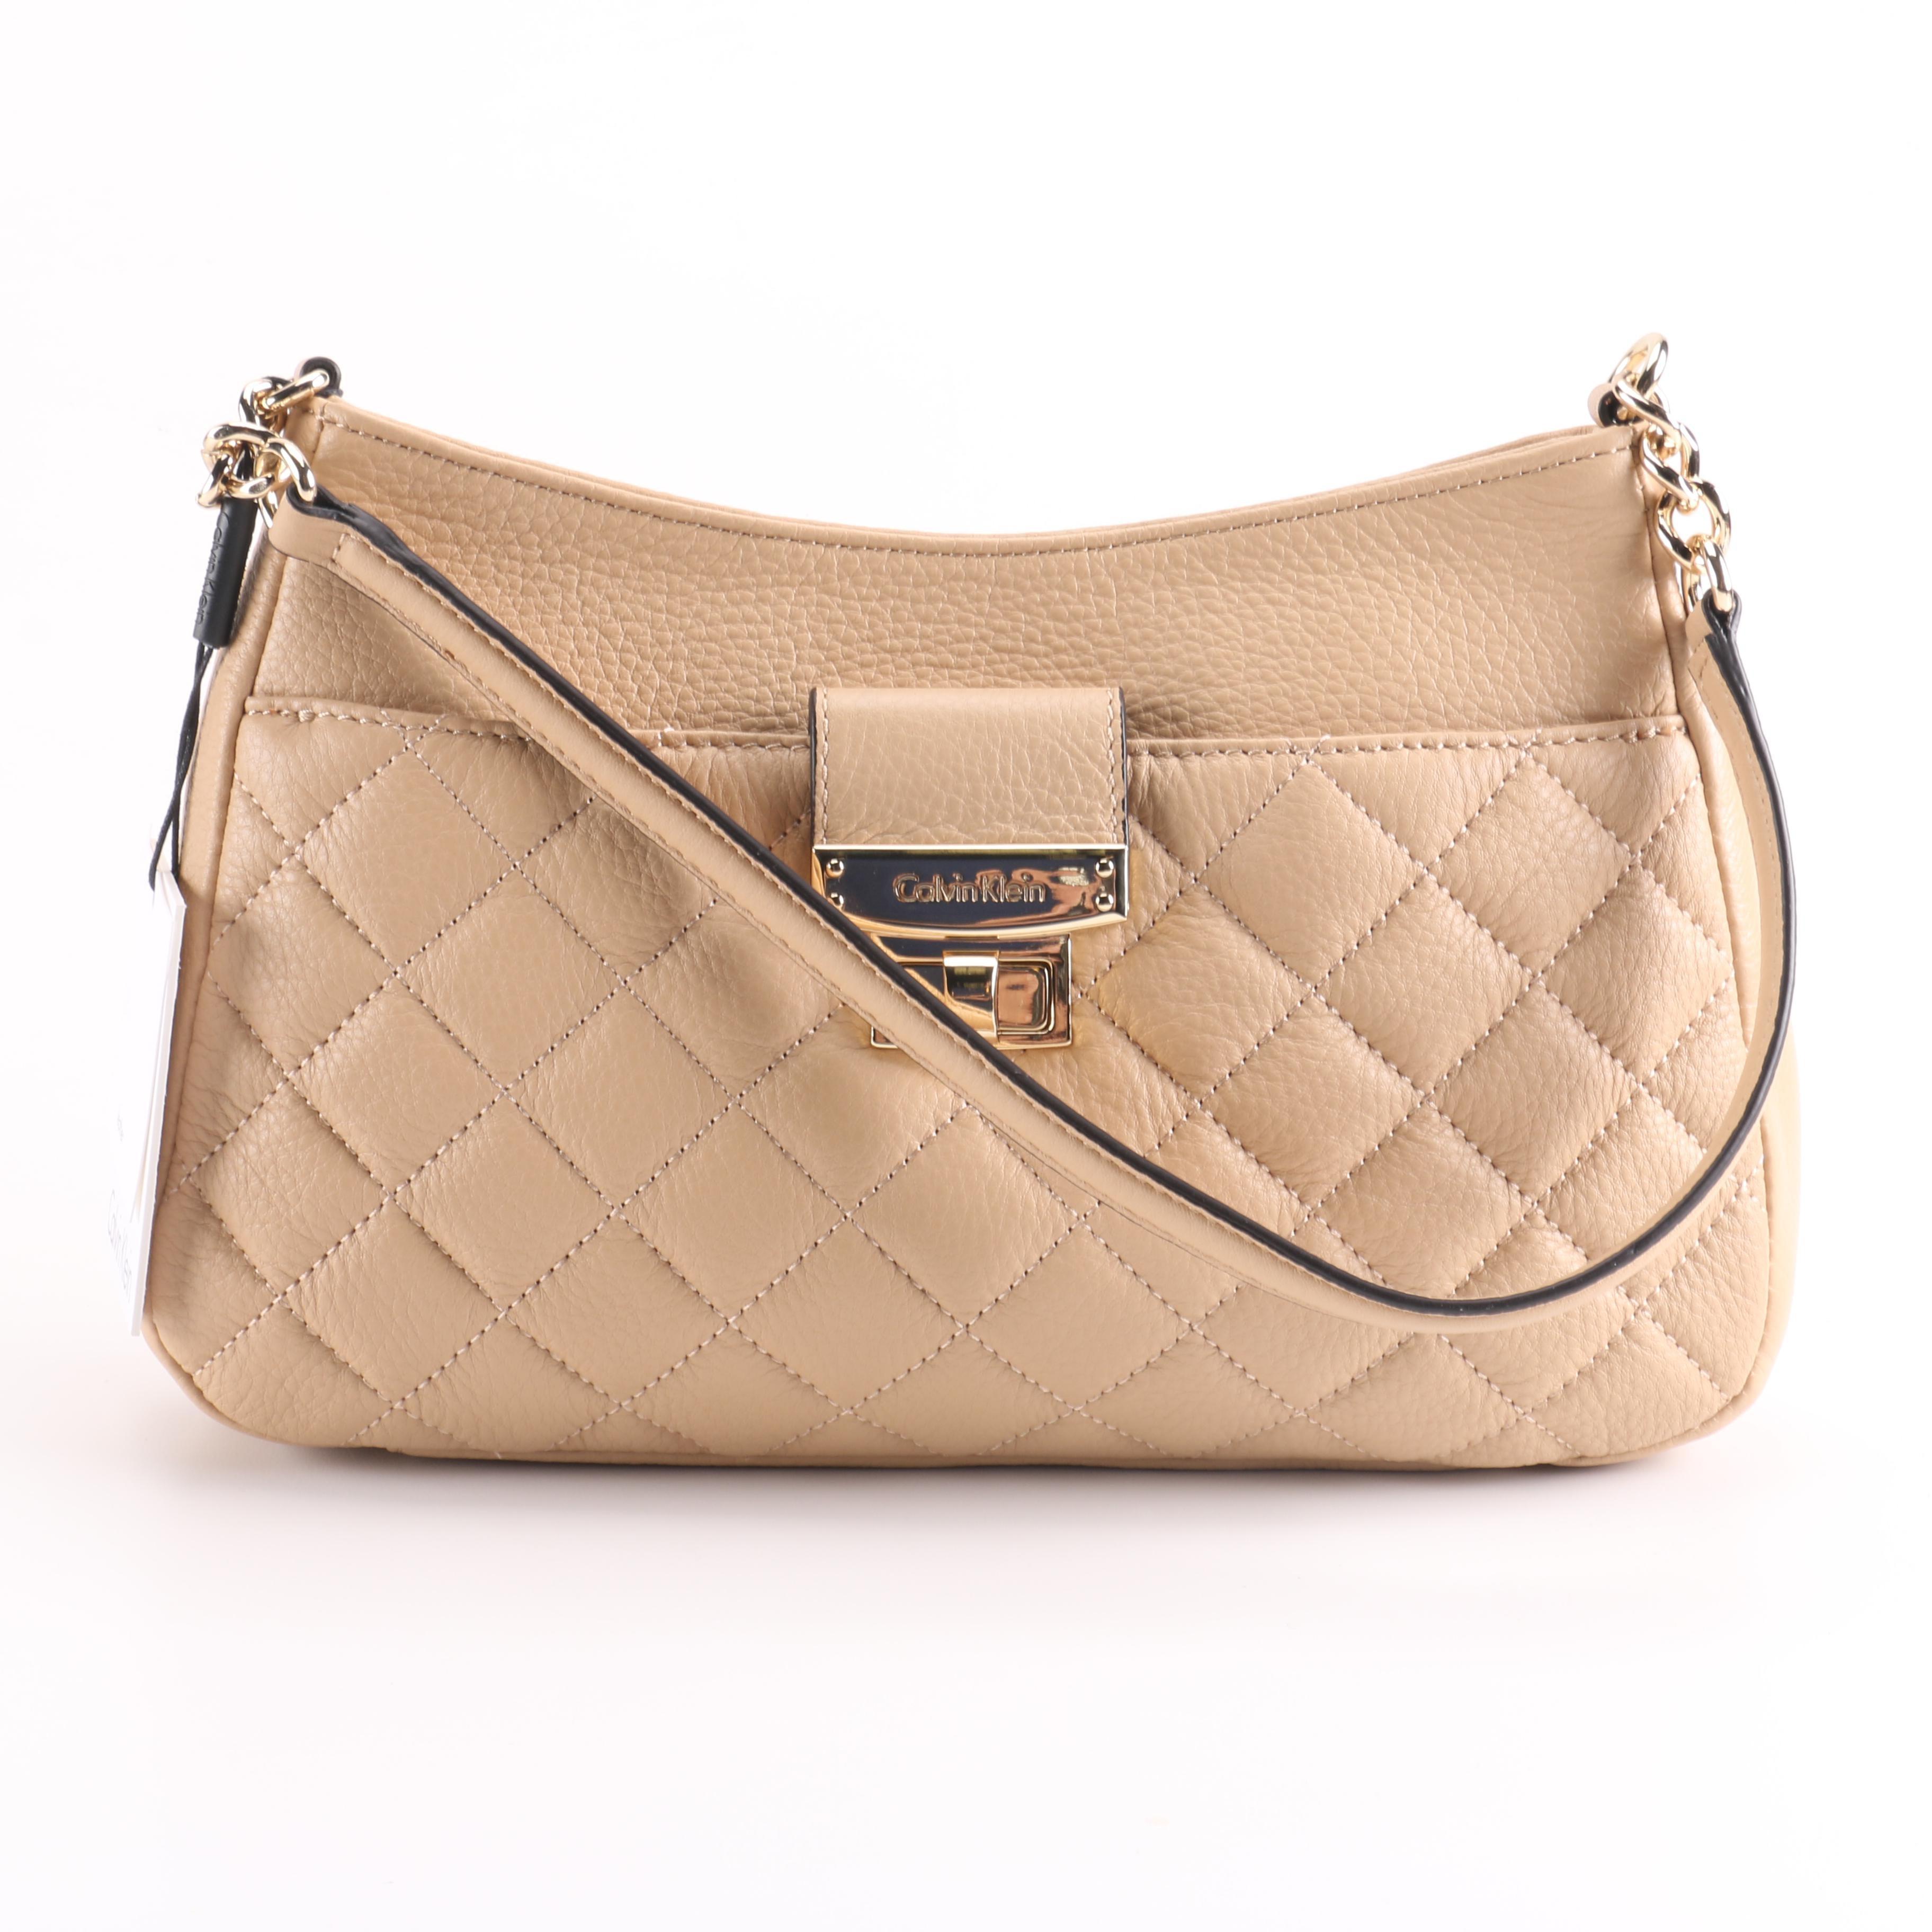 Calvin Klein Nude Leather Handbag